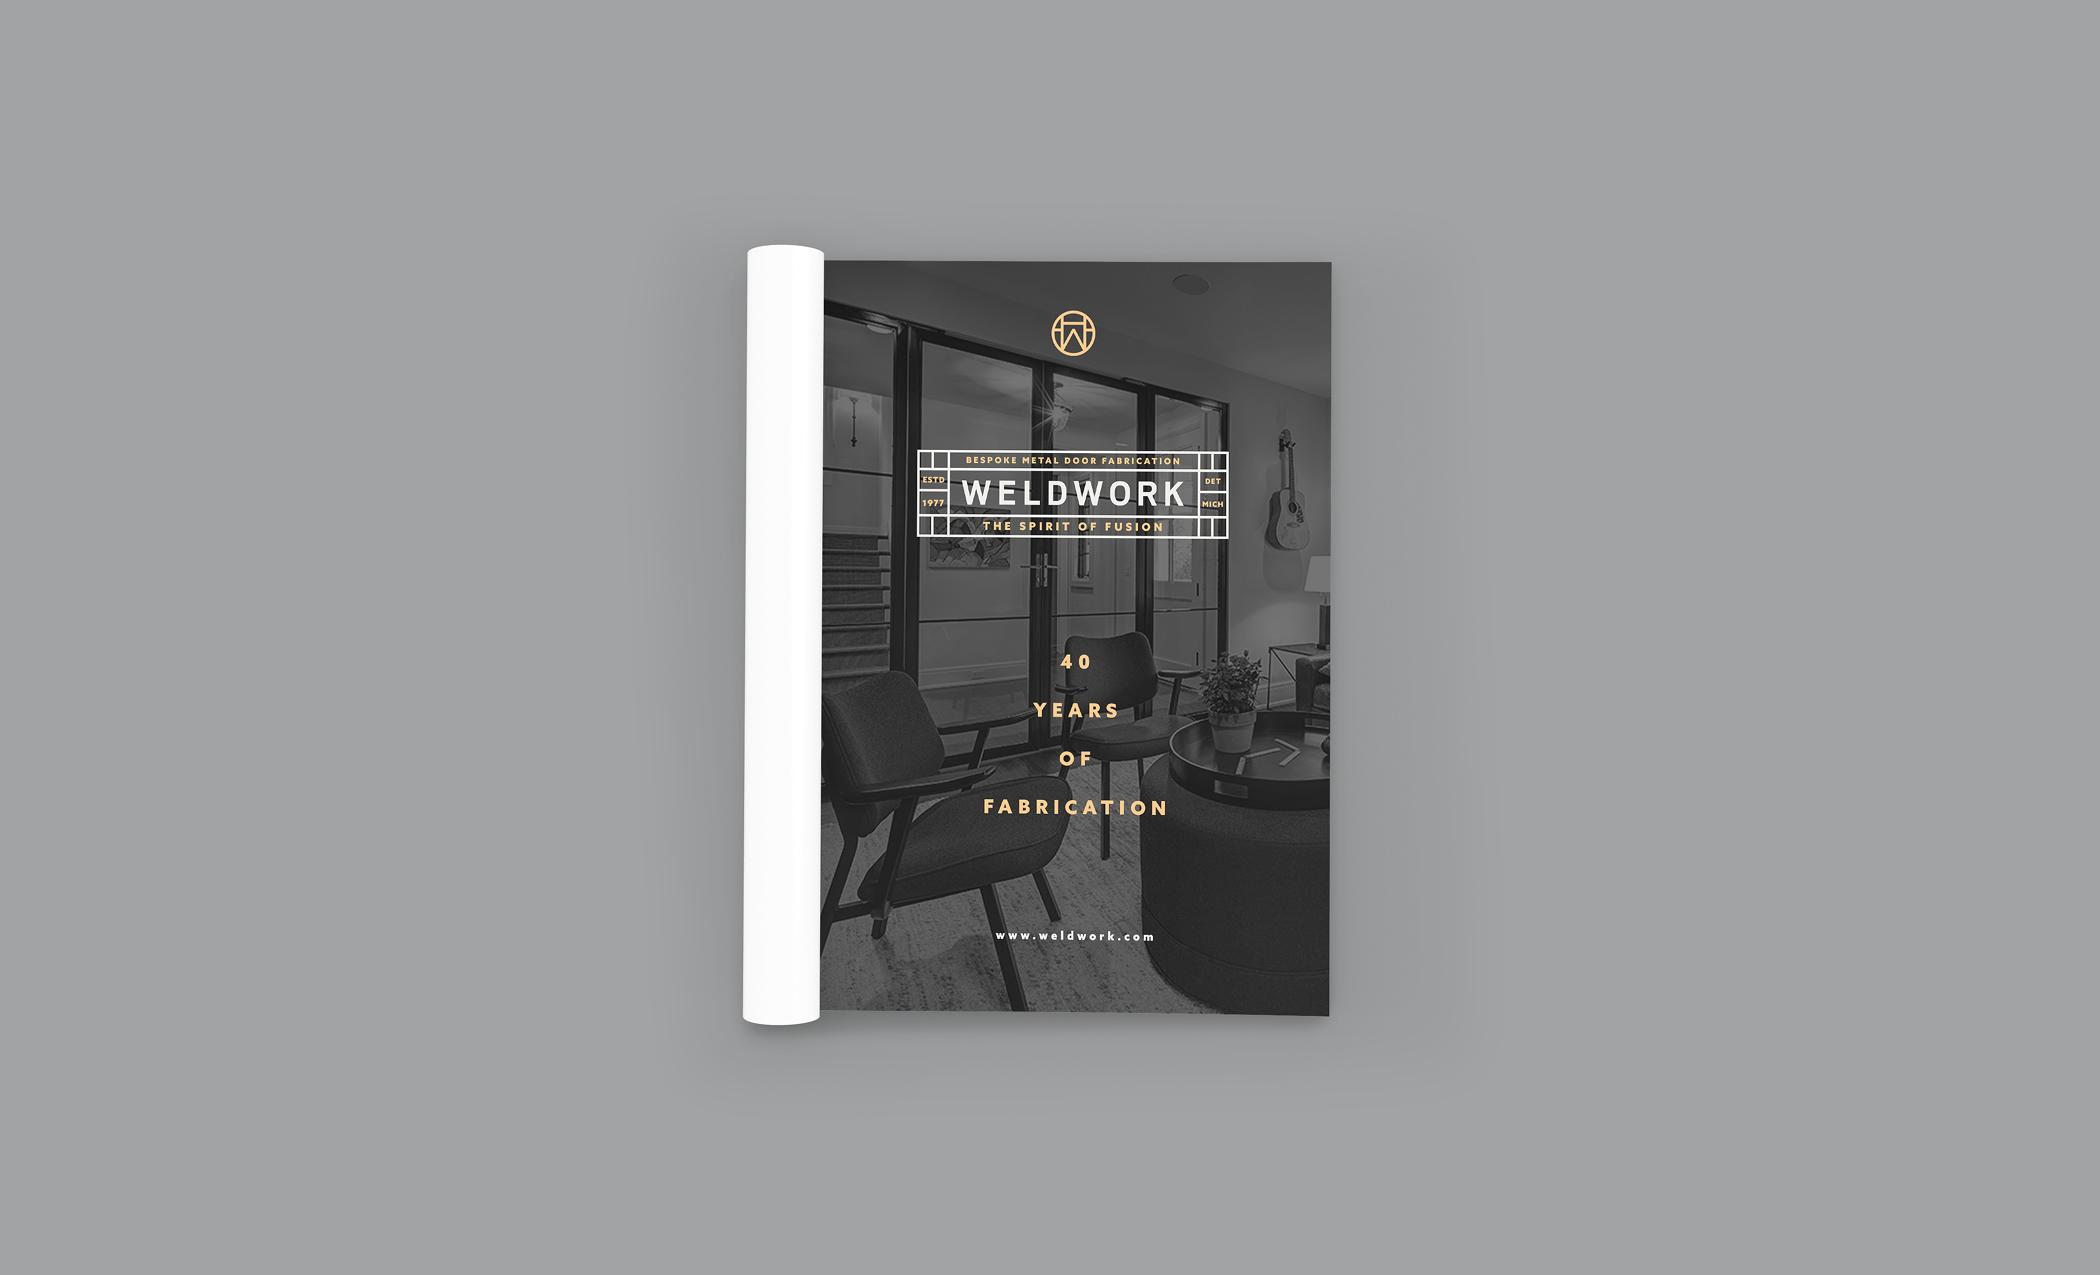 omit-studios-miami-weldwork-detroit-branding-12.jpg